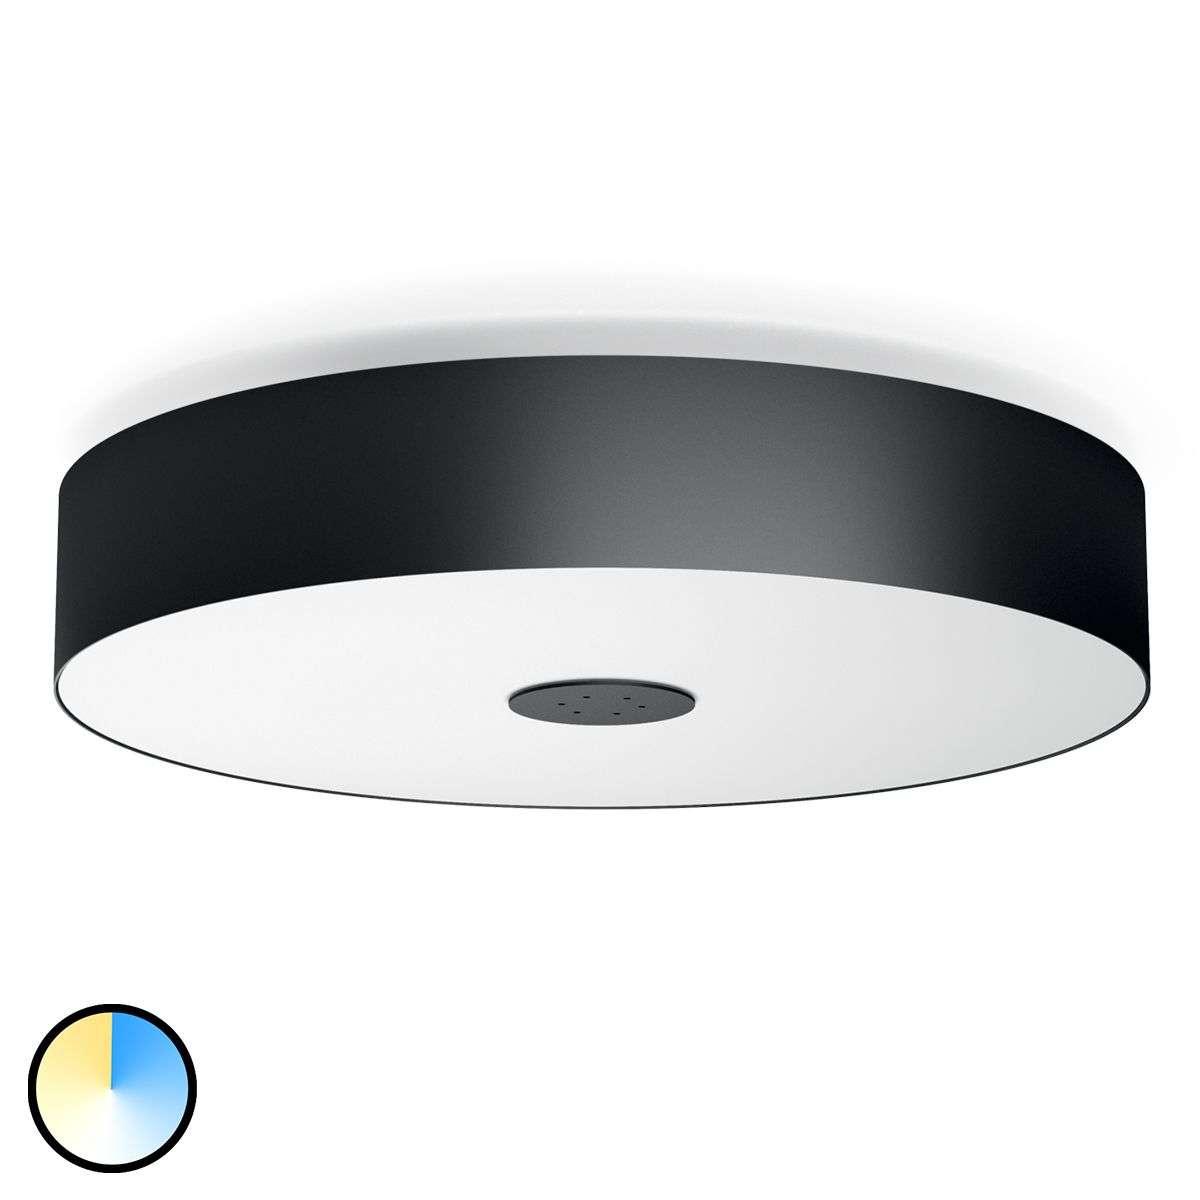 Remote control philips hue led ceiling light fair lights remote control philips hue led ceiling light fair 7531870 31 aloadofball Images